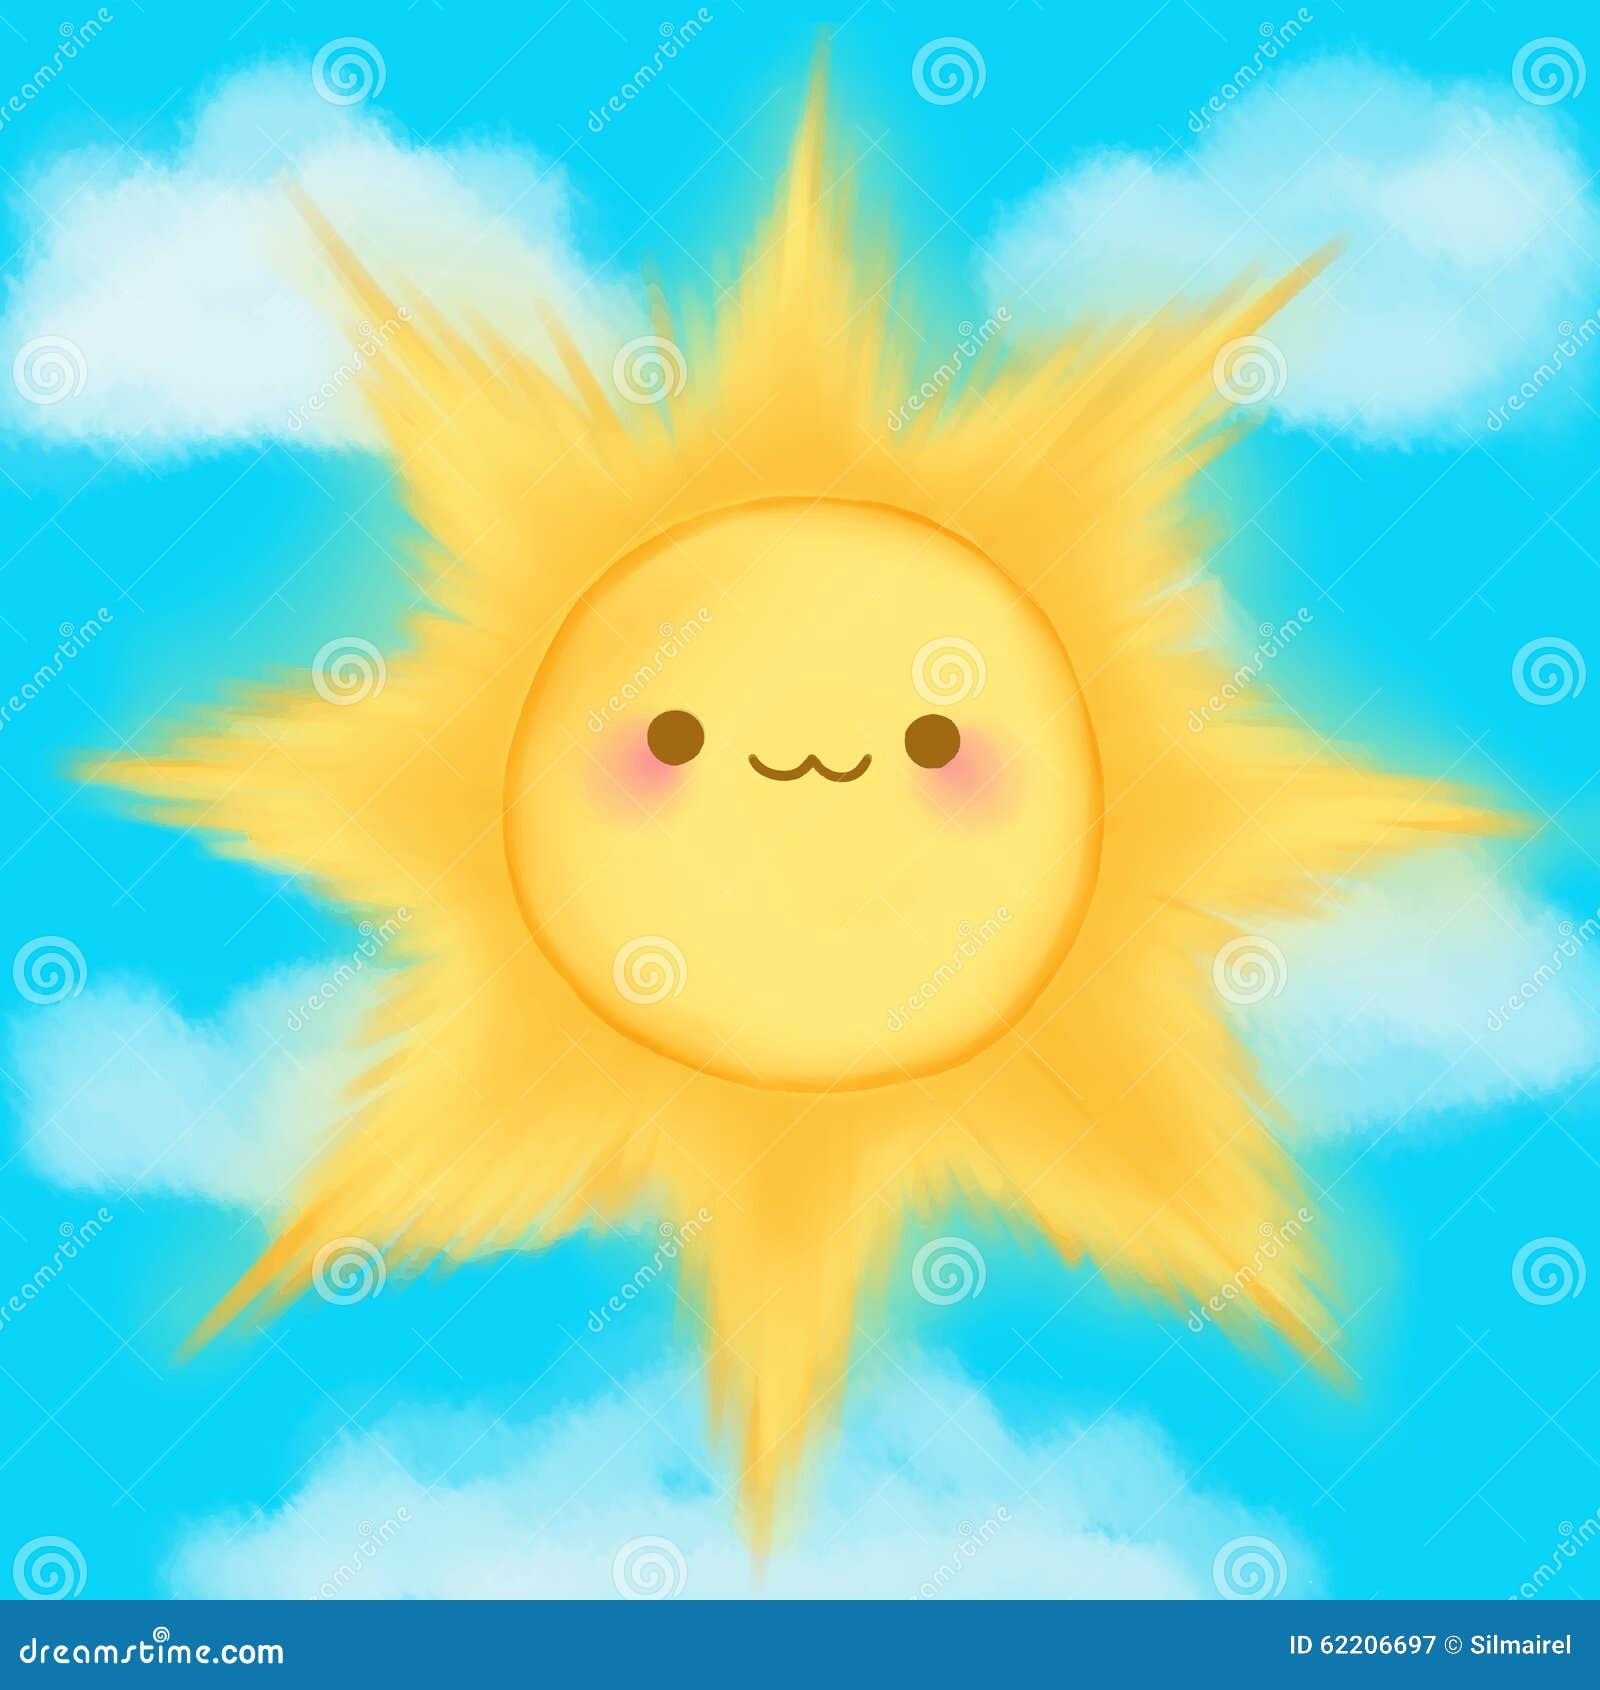 Cute Cartoon Smiling Sun Clouds Sky Kawaii Anime Manga Stock ...